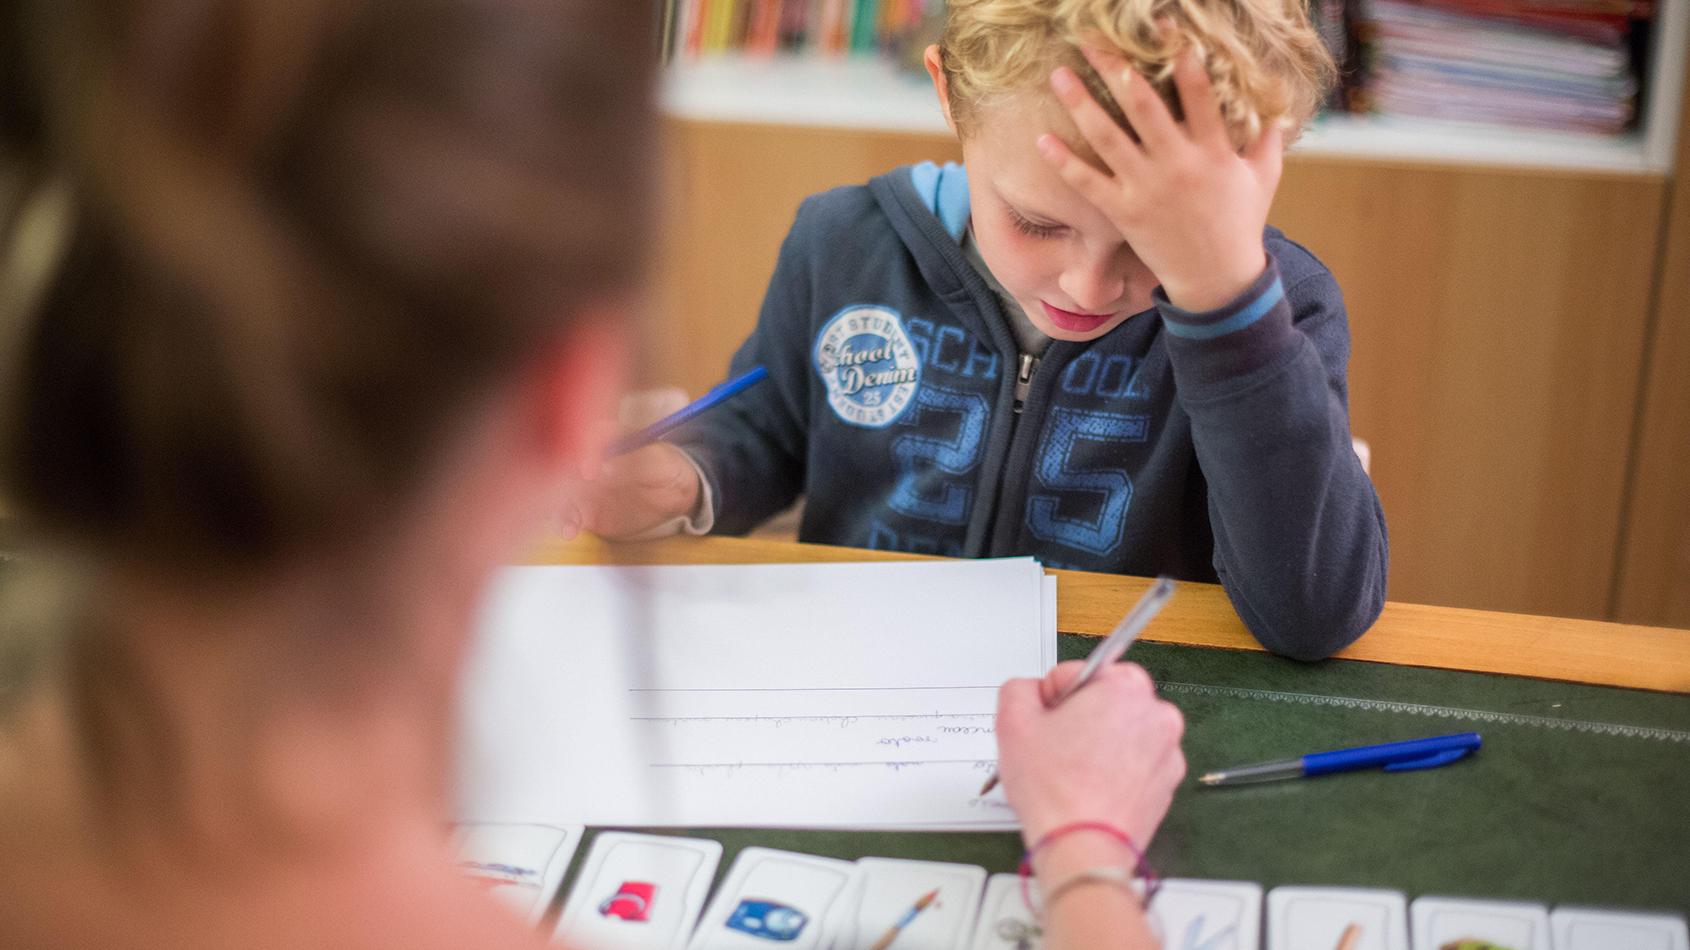 children with non-verbal autism